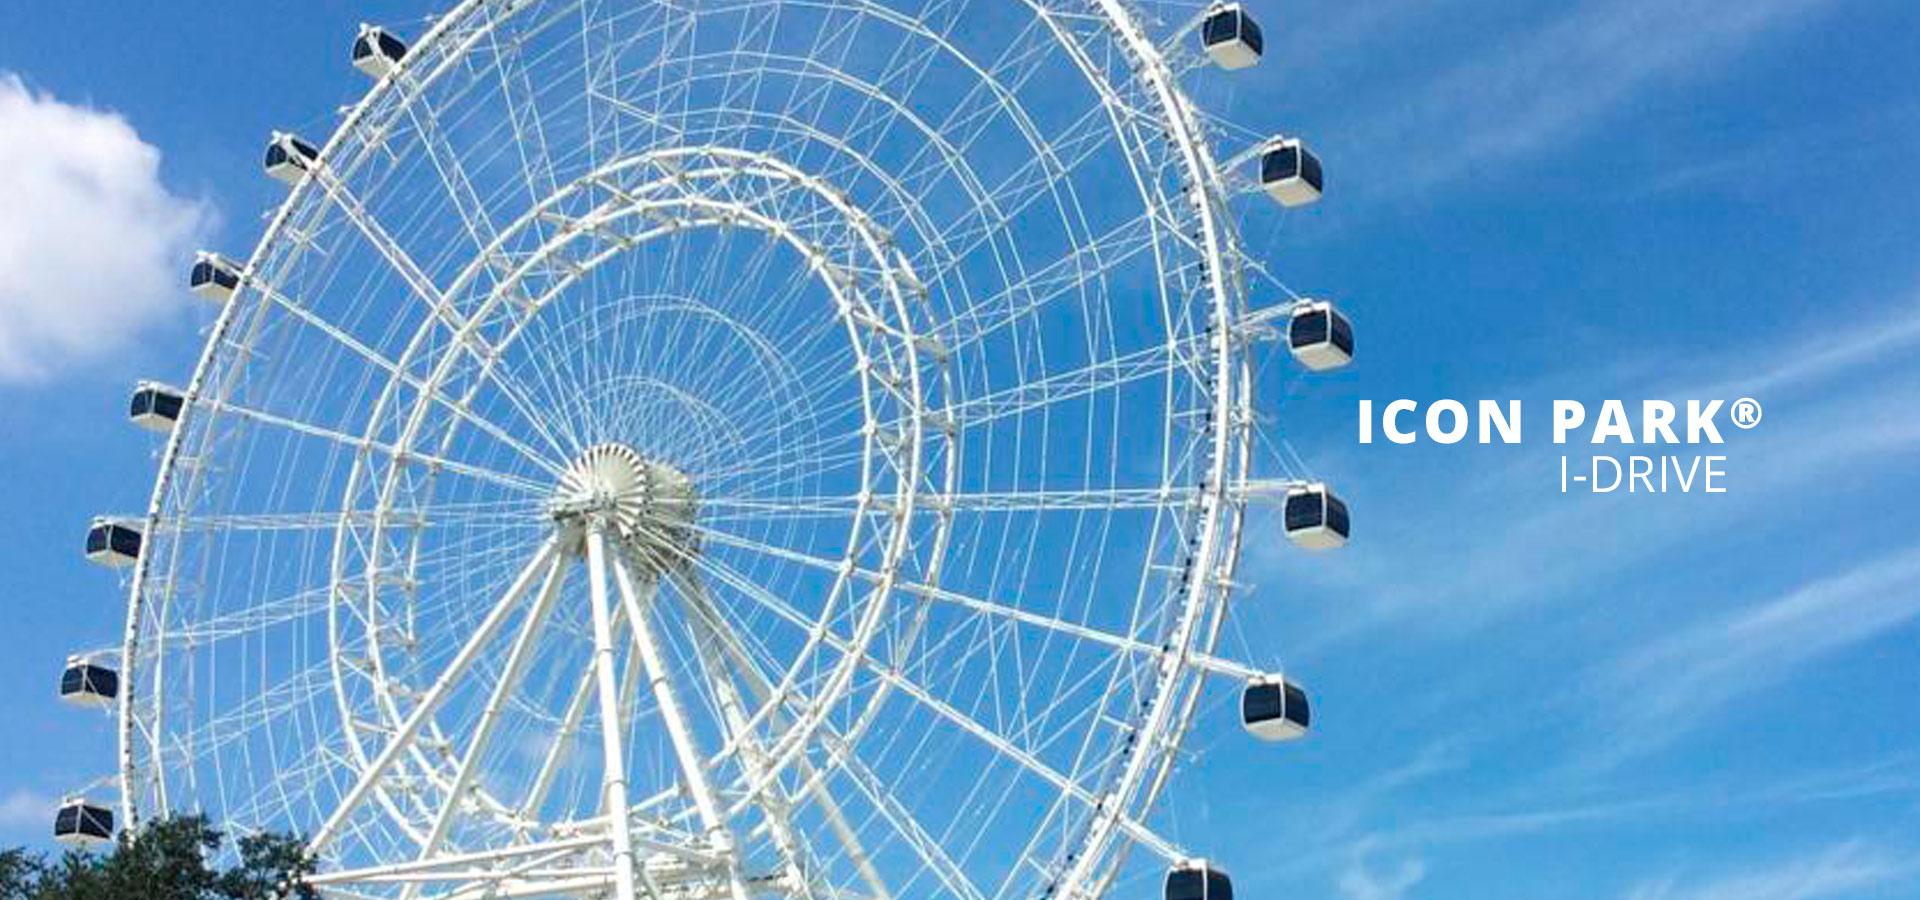 Hotel Monreale Express I-Drive - Icon Park